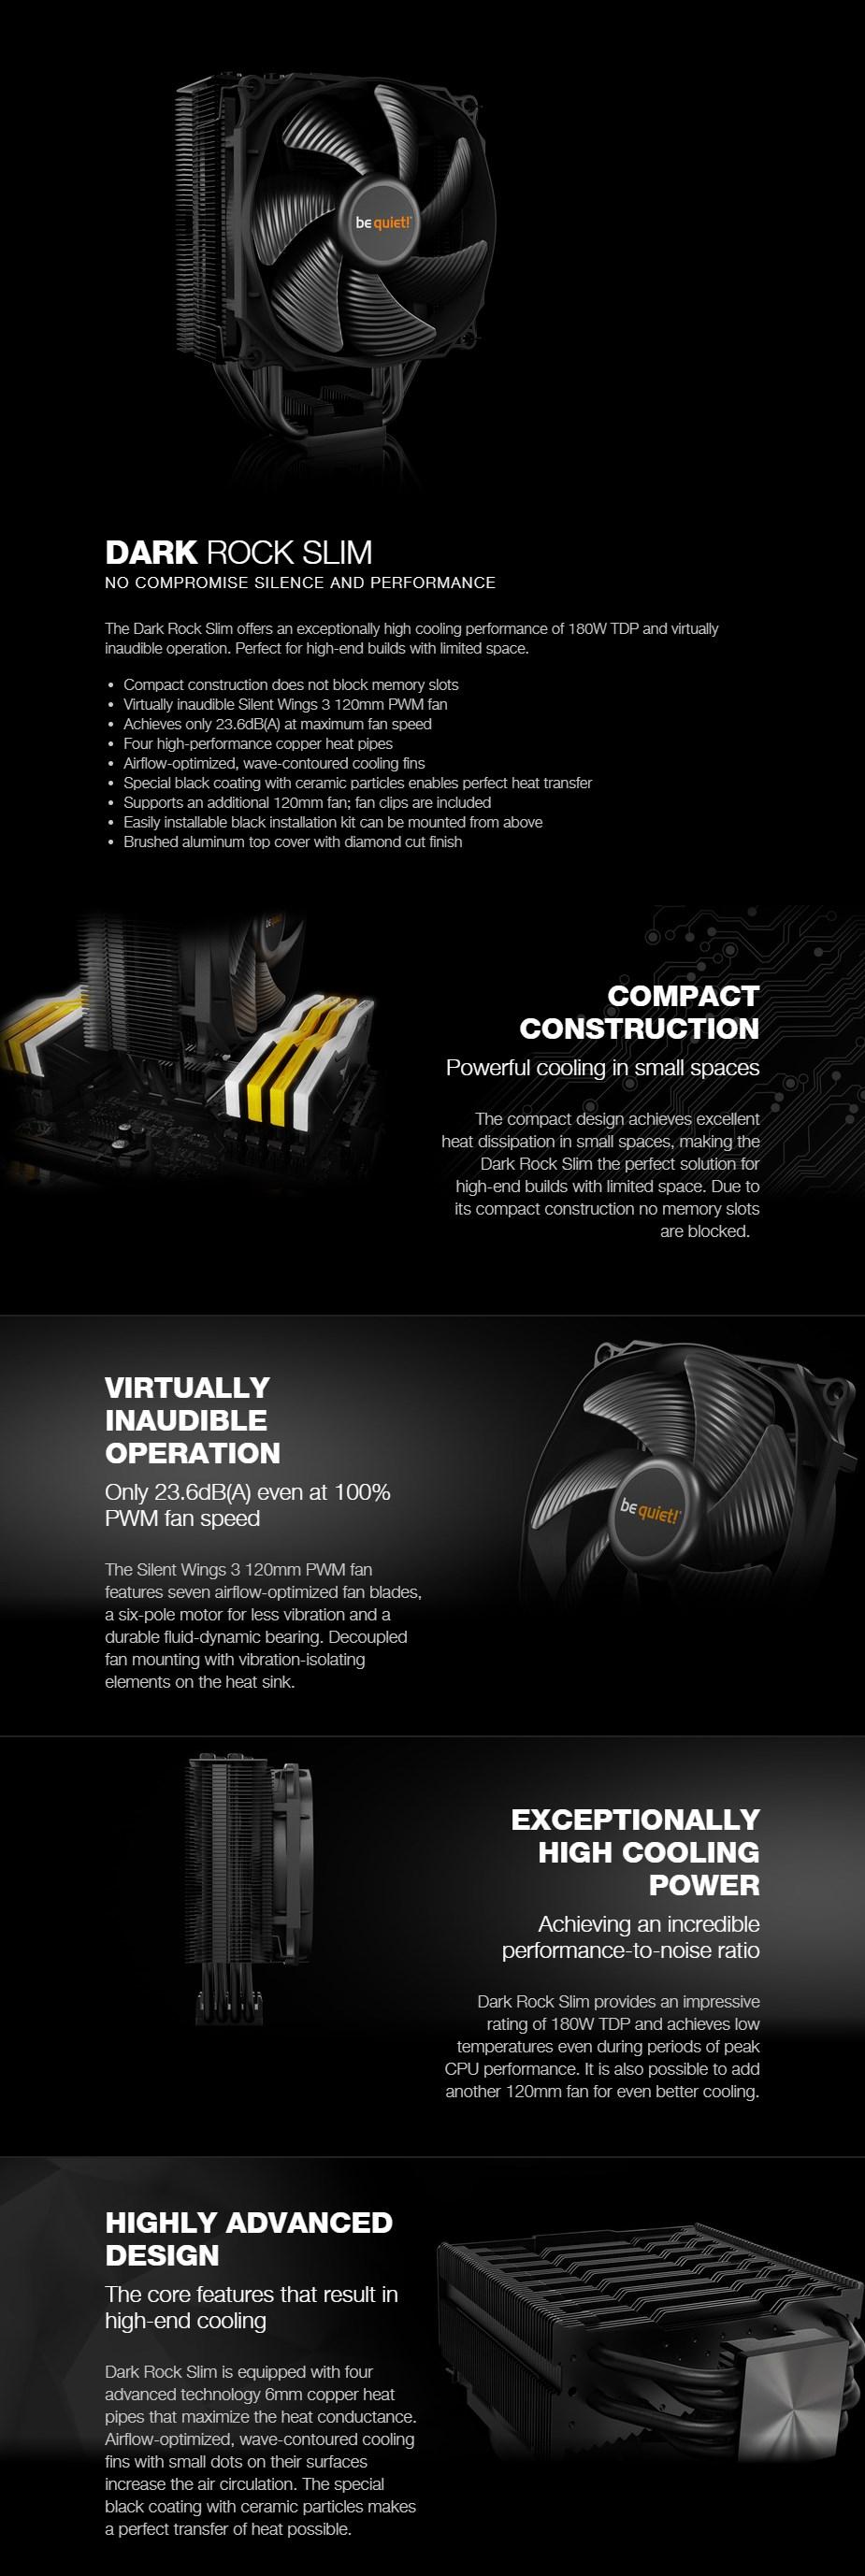 be quiet! Dark Rock Slim CPU Air Cooler - Overview 1